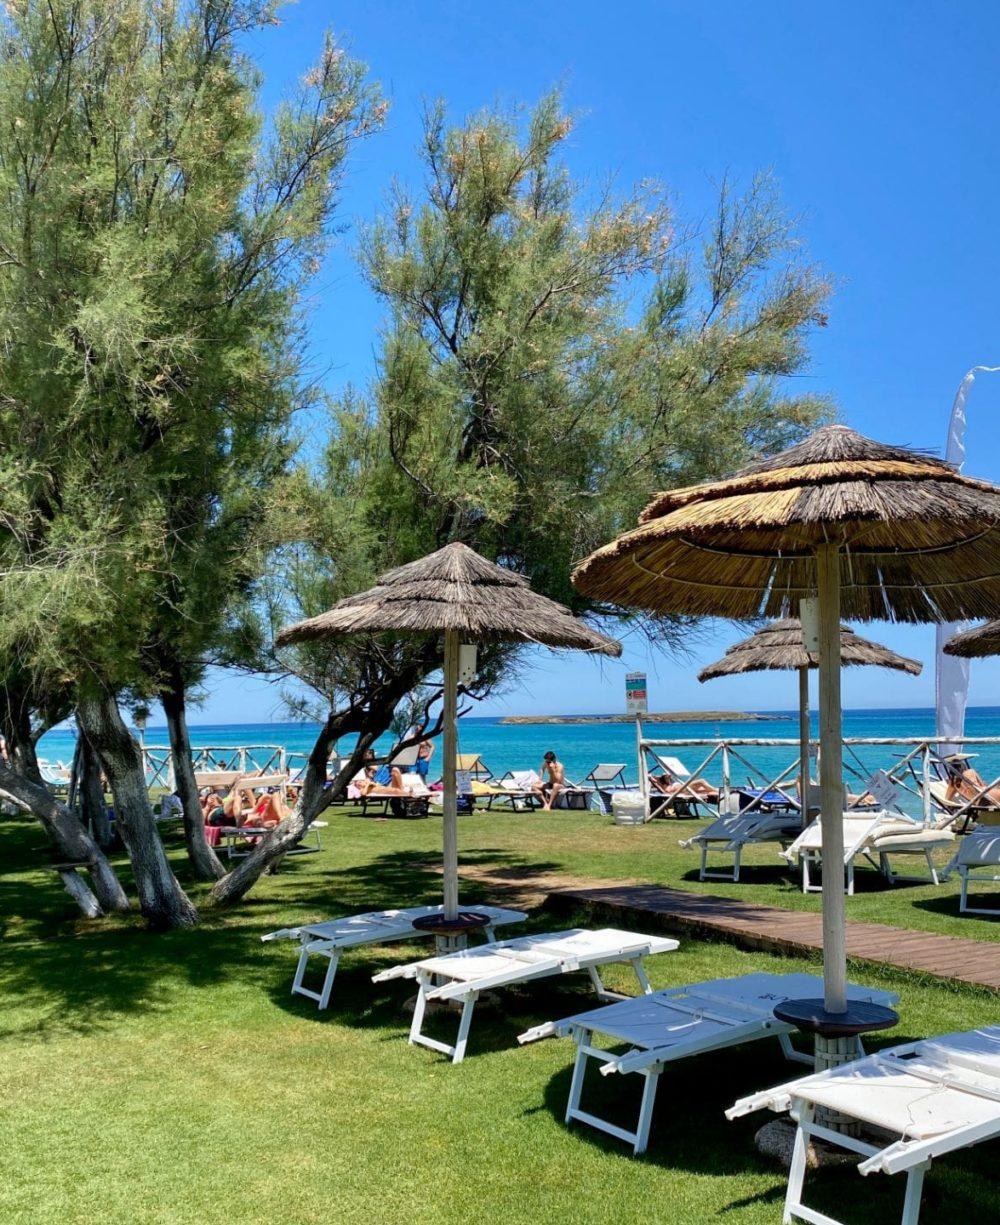 Lido Guna Beach